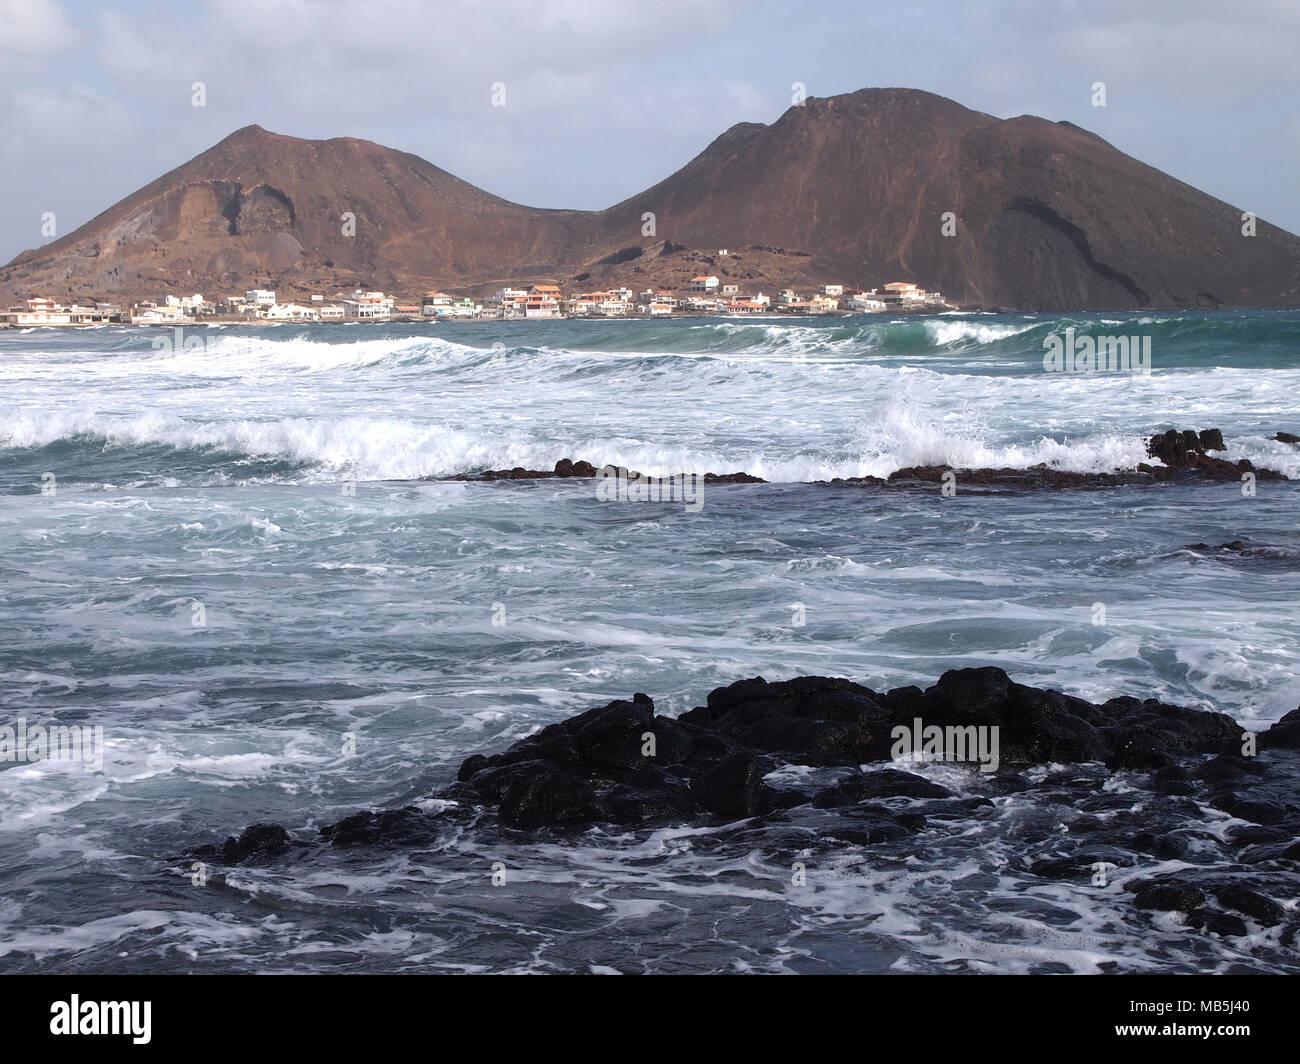 2019 authentique 2019 original remise chaude The village of Calhau in Sao Vicente, one of the Cape Verde ...